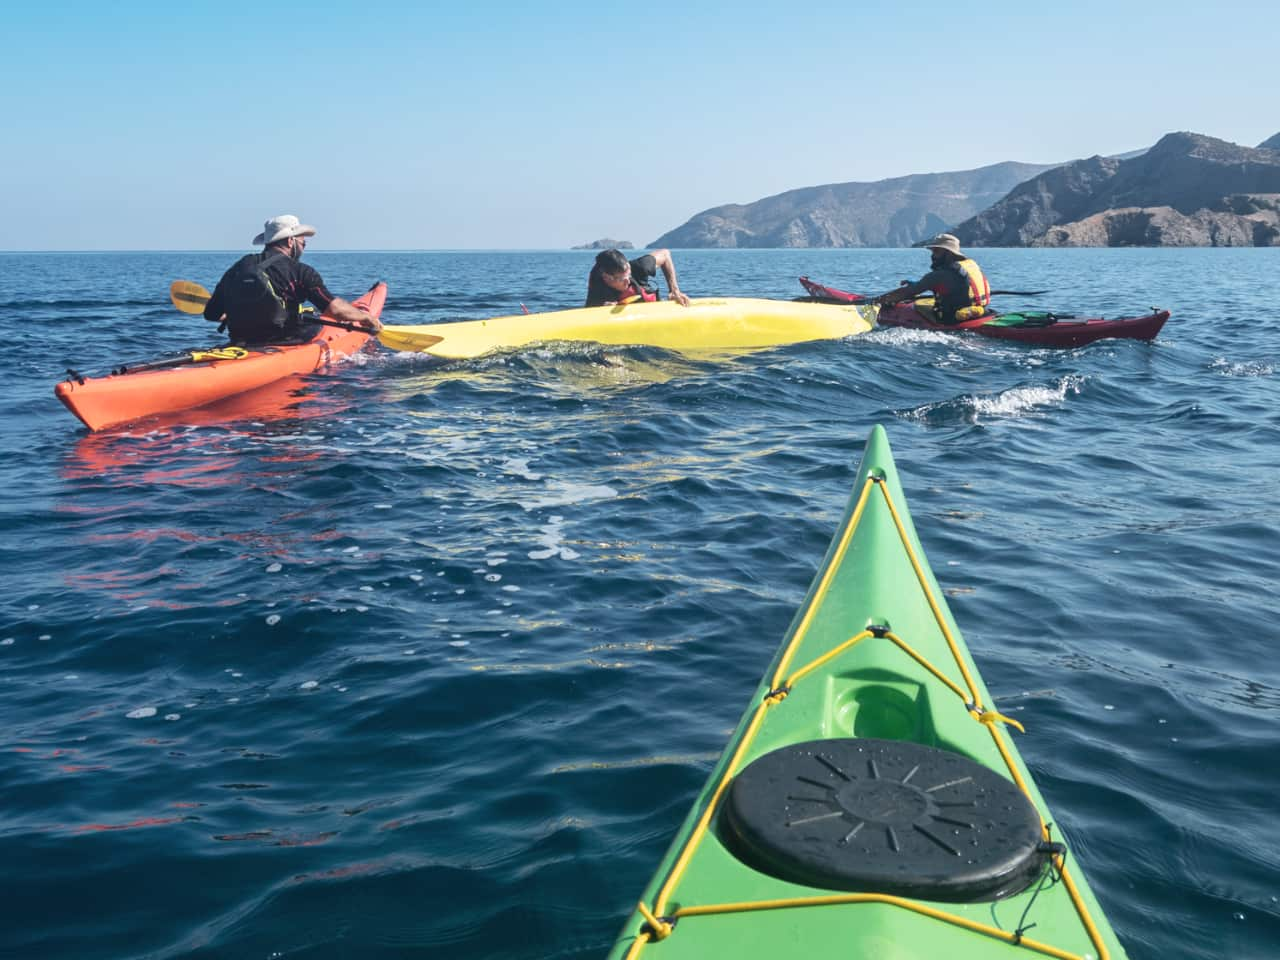 Sea Kayaking Introduction Course - Level 1 Sea Kayak Course, Sea Kayaking Introduction Course crete, Sea Kayaking Introduction Course chania crete, Sea Kayaking Introduction Course heraklion crete, best sea kayak courses crete